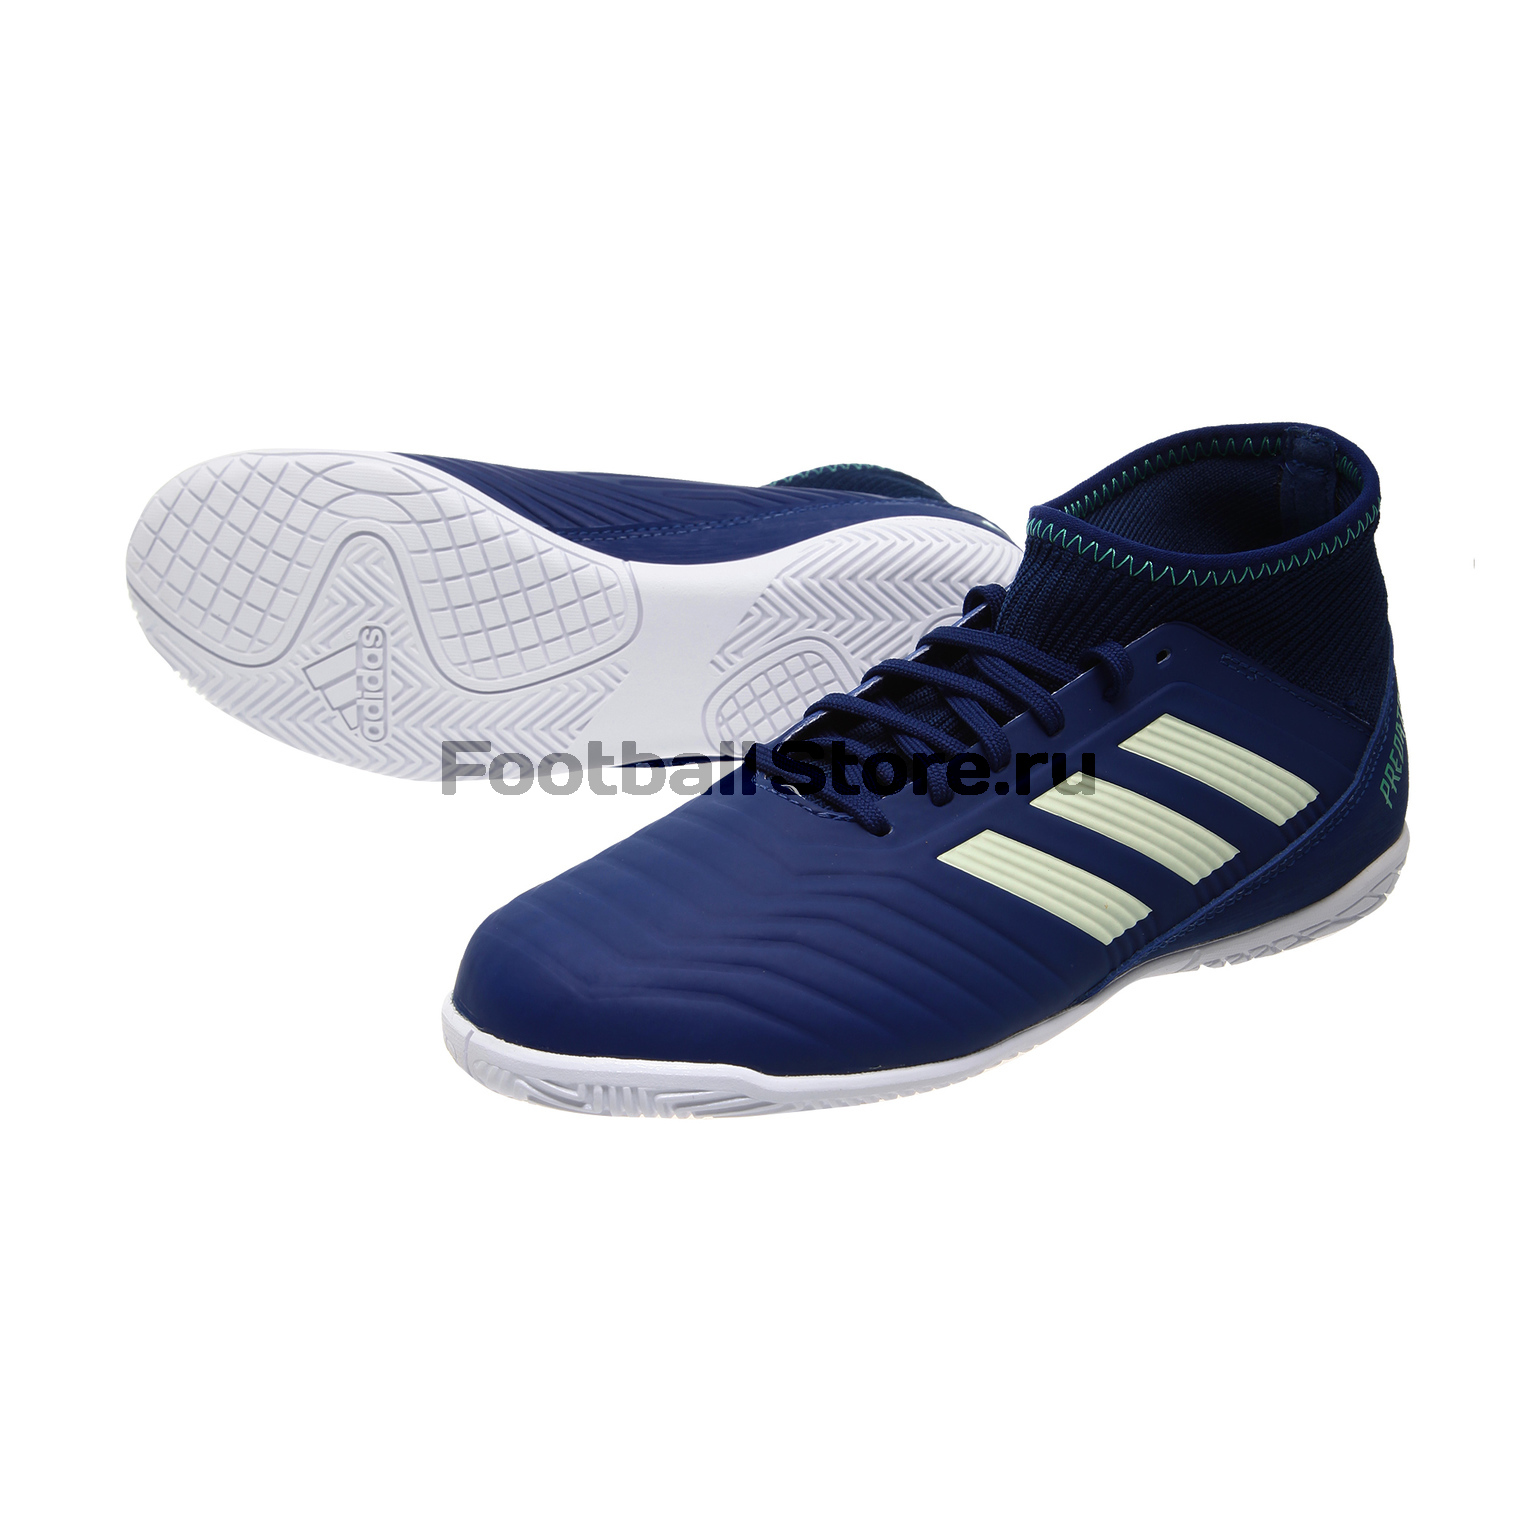 Футзалки детские Adidas ACE Tango 18.3 IN CP9075 обувь для зала adidas ace tango 18 3 in jr cp9075